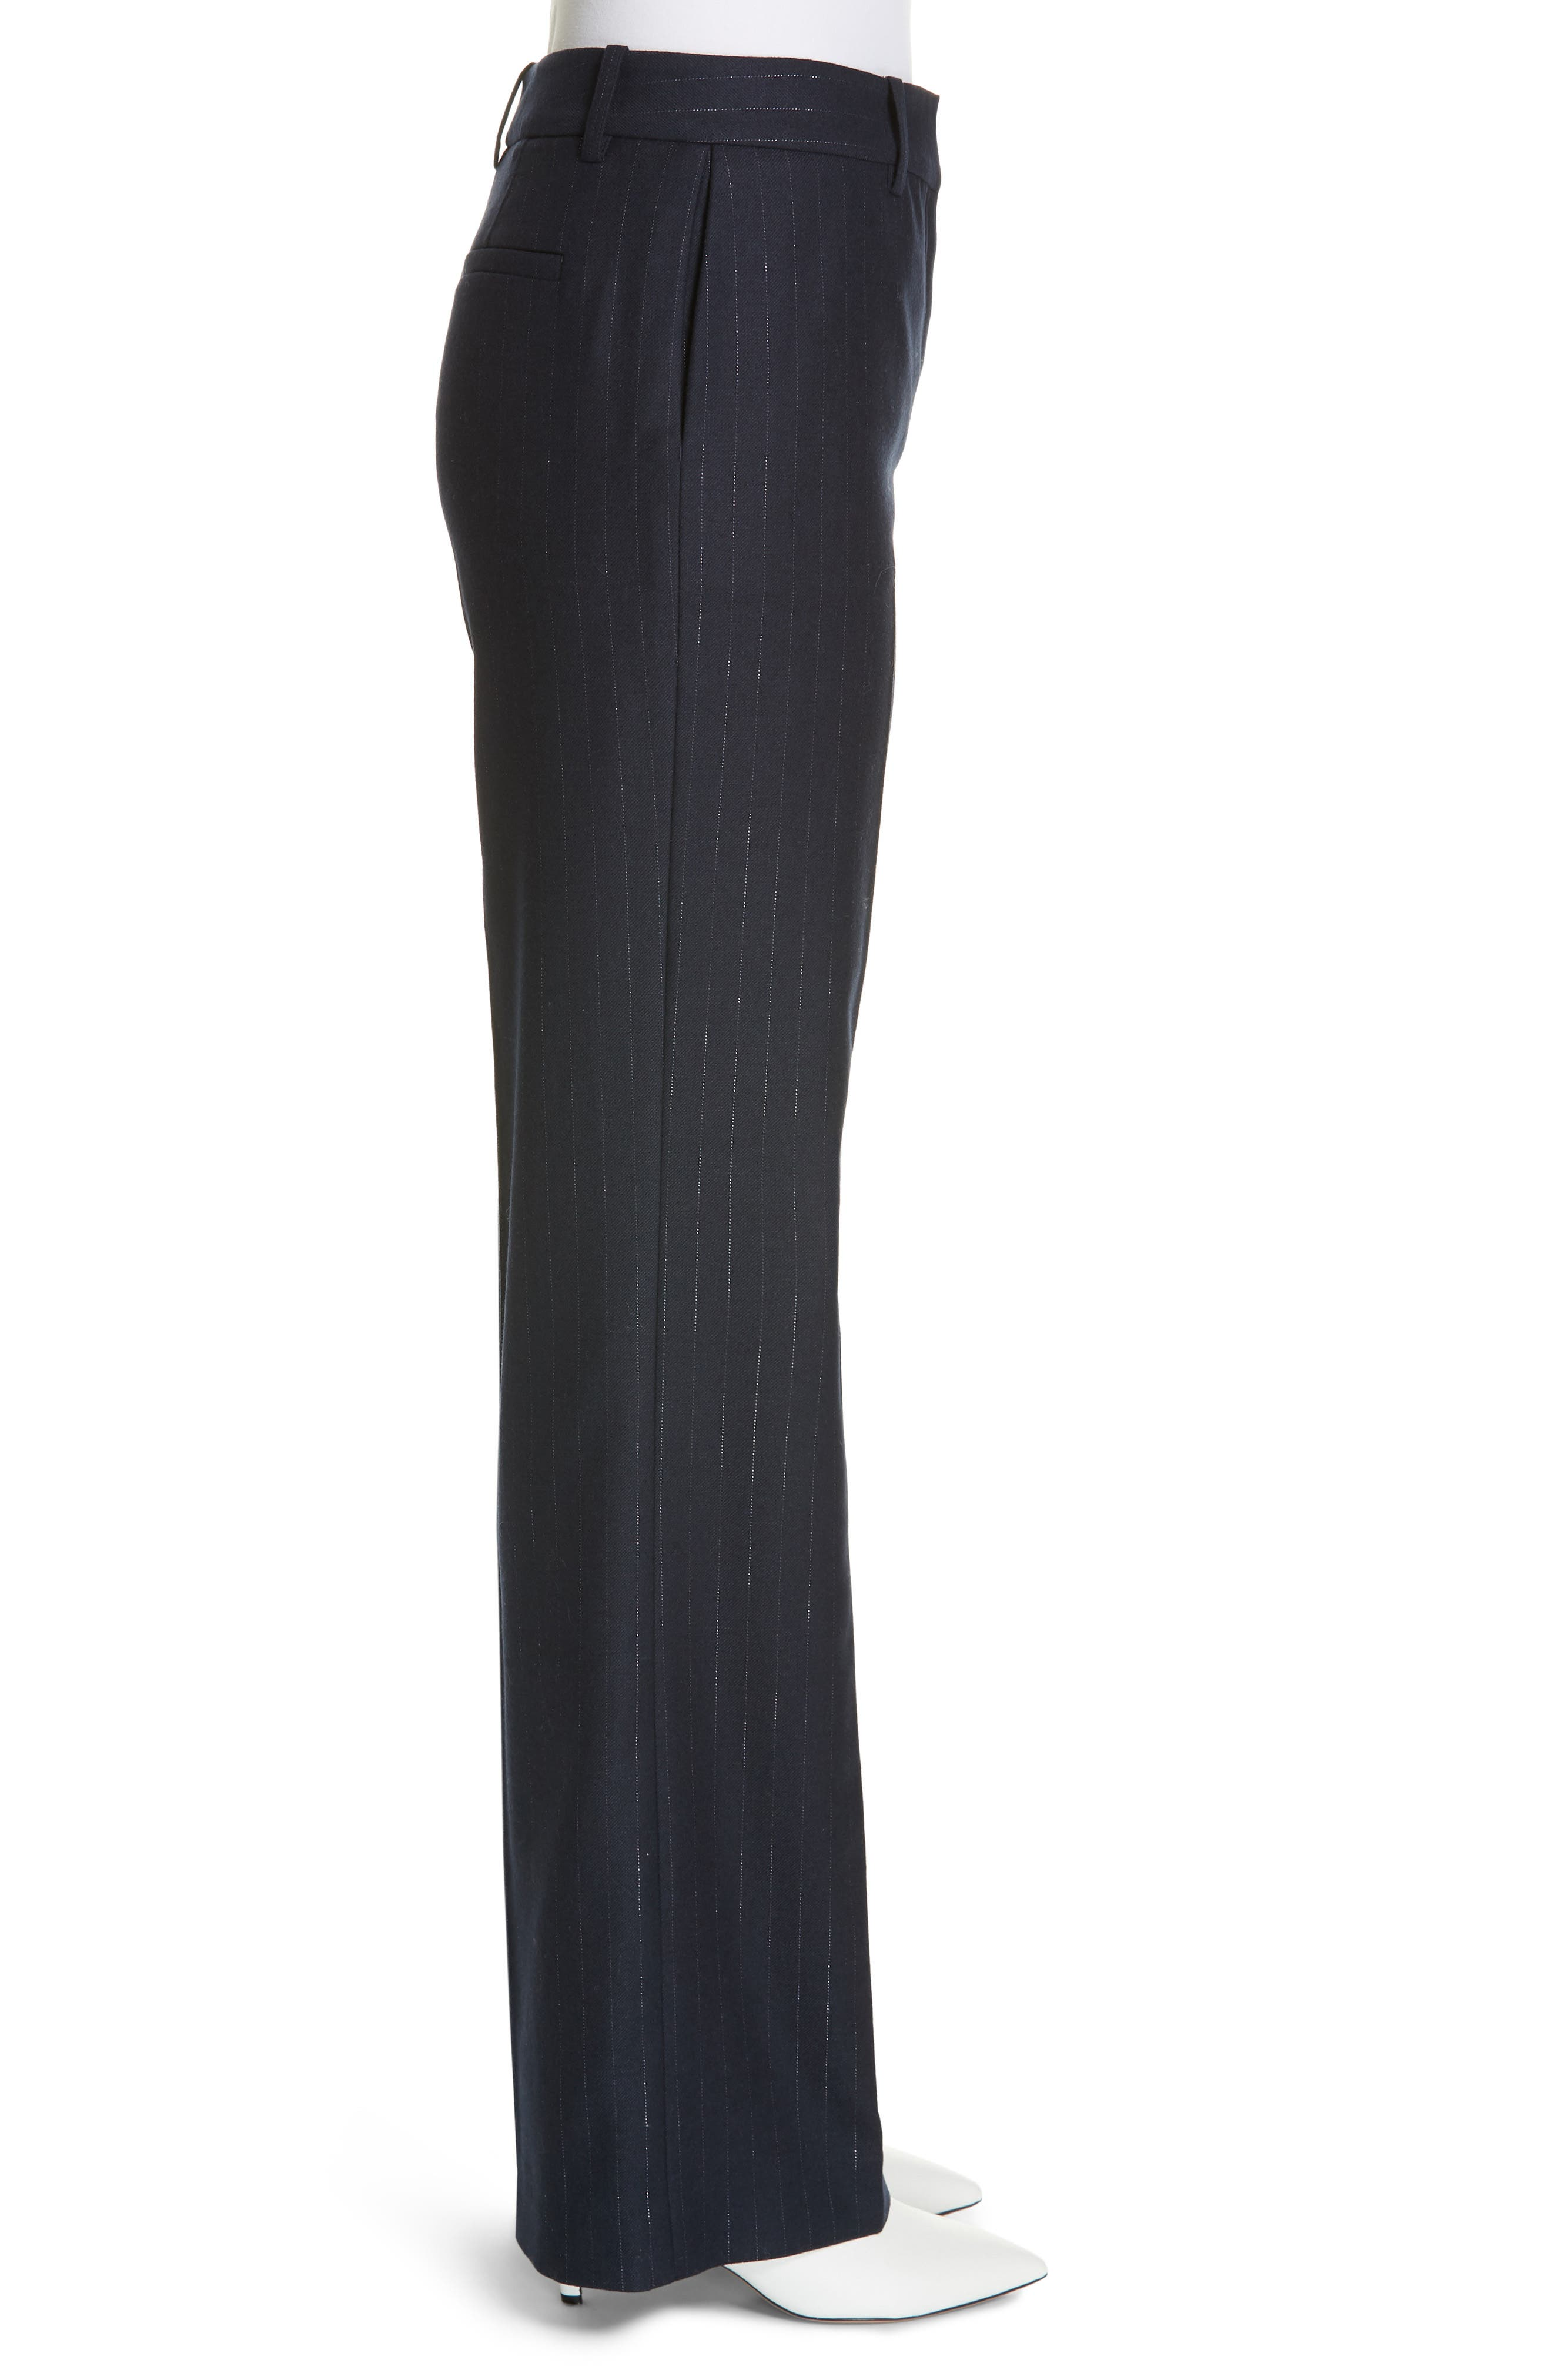 Hagan Trousers,                             Alternate thumbnail 3, color,                             NAVY